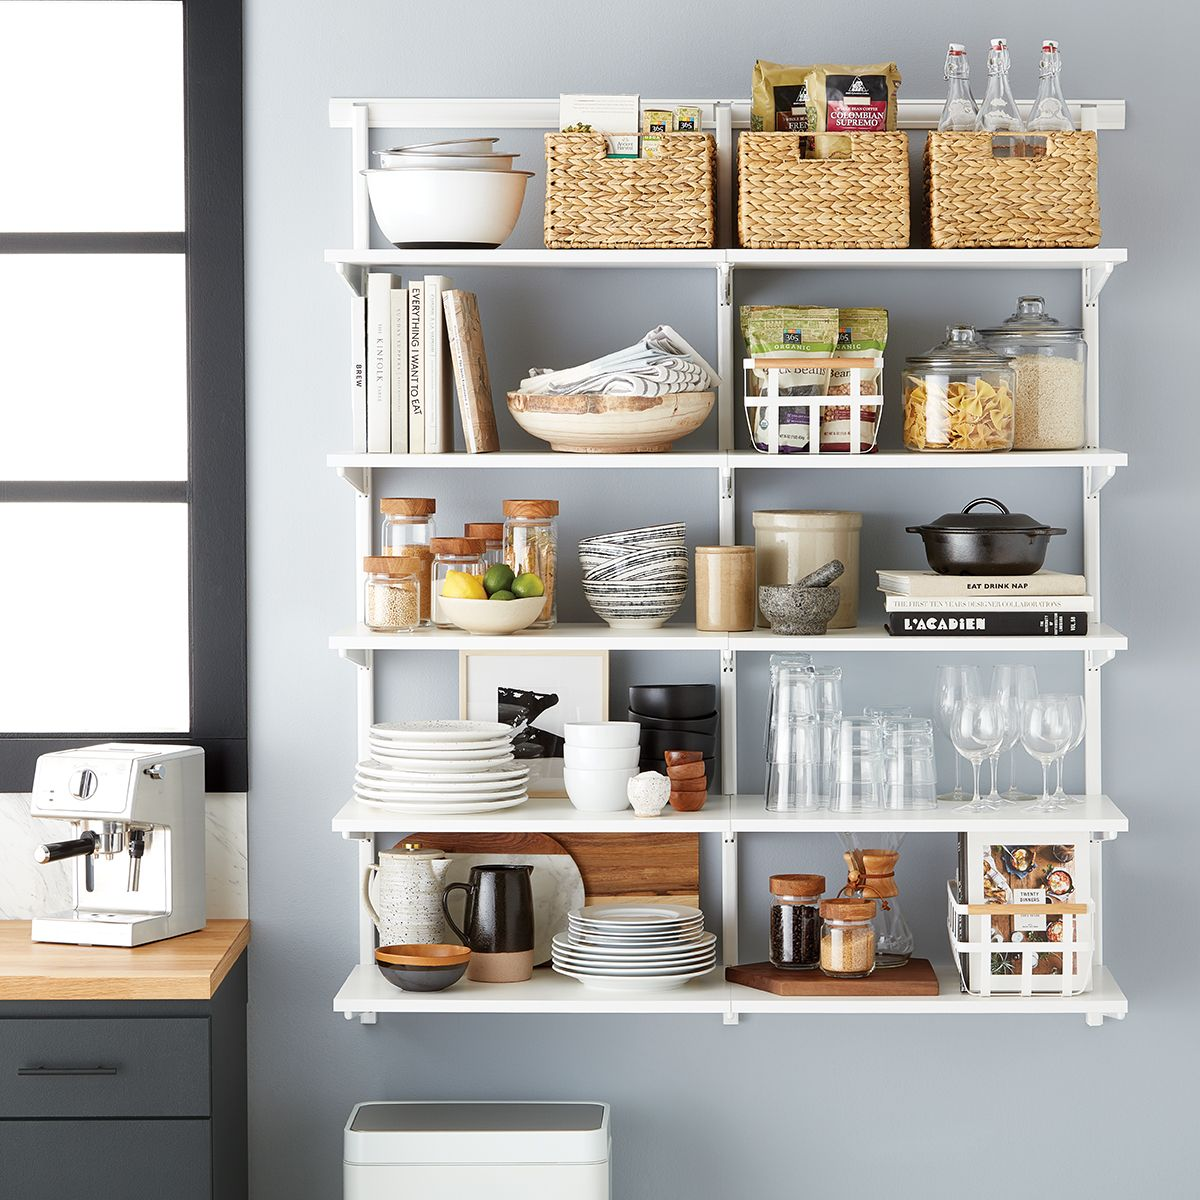 Elfa Classic 4 Open Kitchen Shelving In 2020 Open Kitchen Shelves Kitchen Shelves Kitchen Storage Shelves